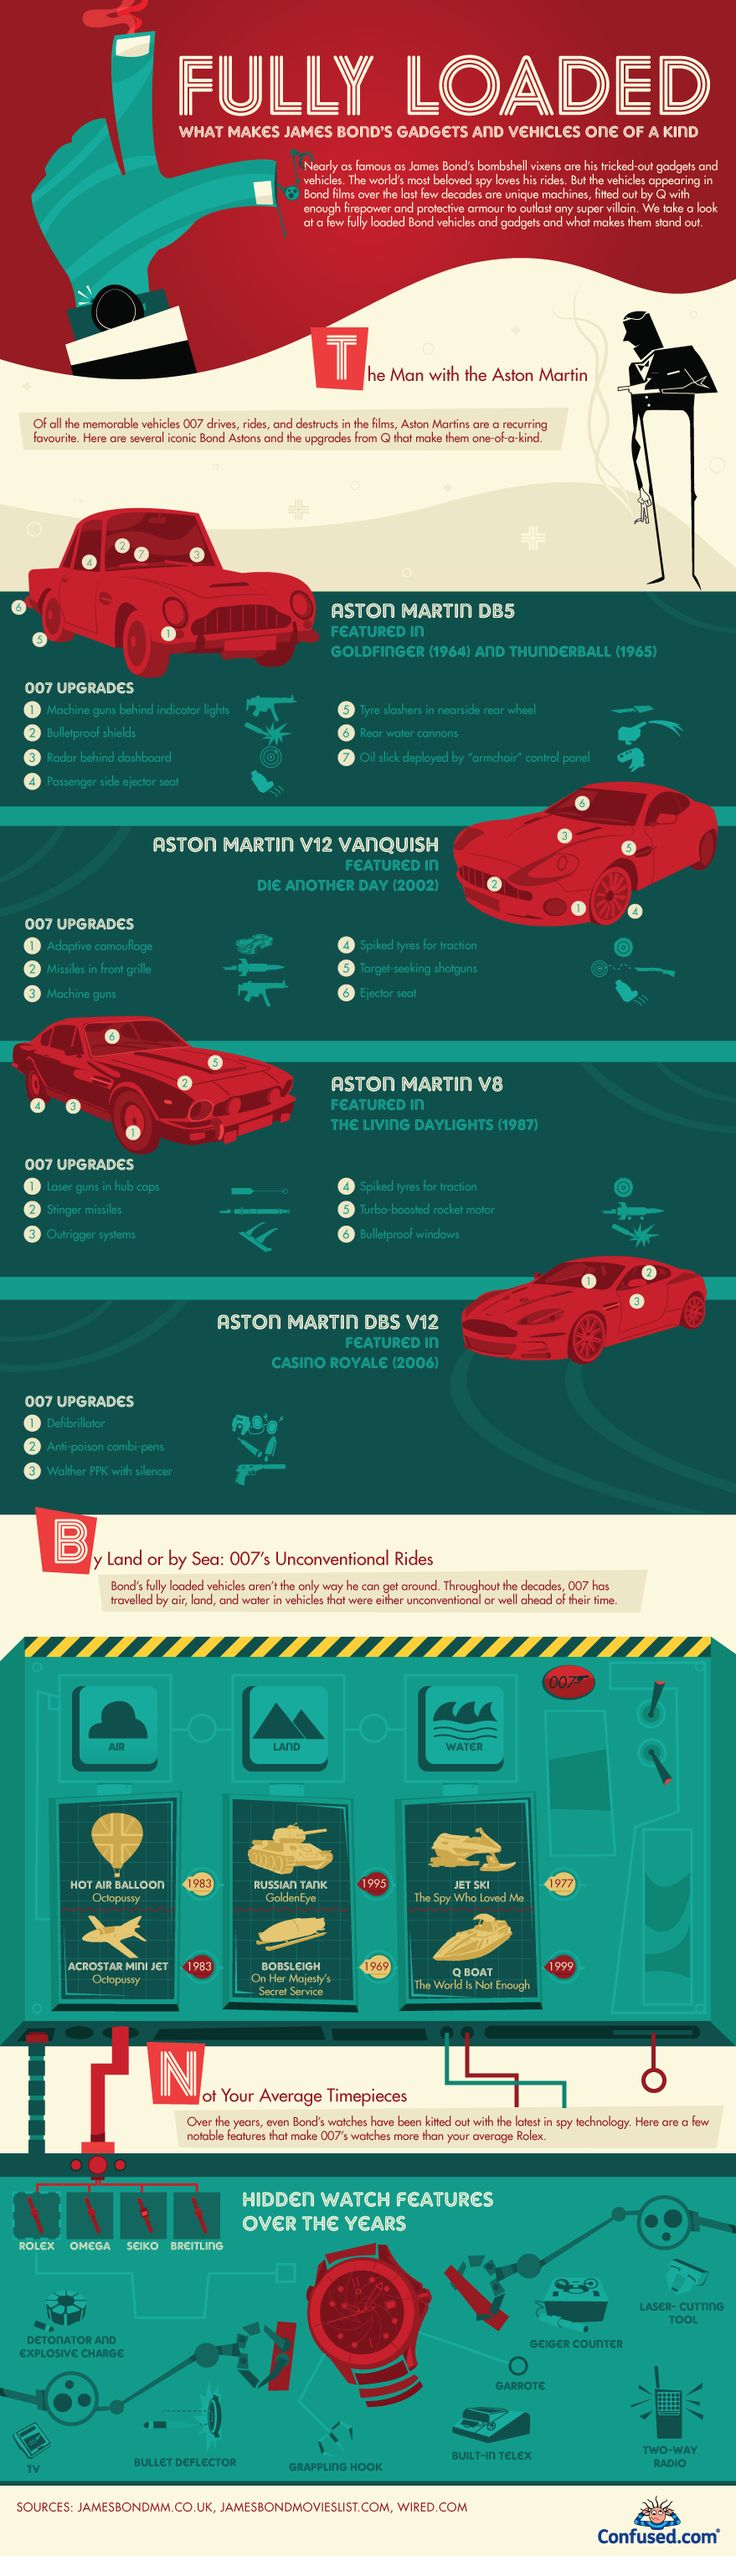 James Bond's Gadgets and Vehicles